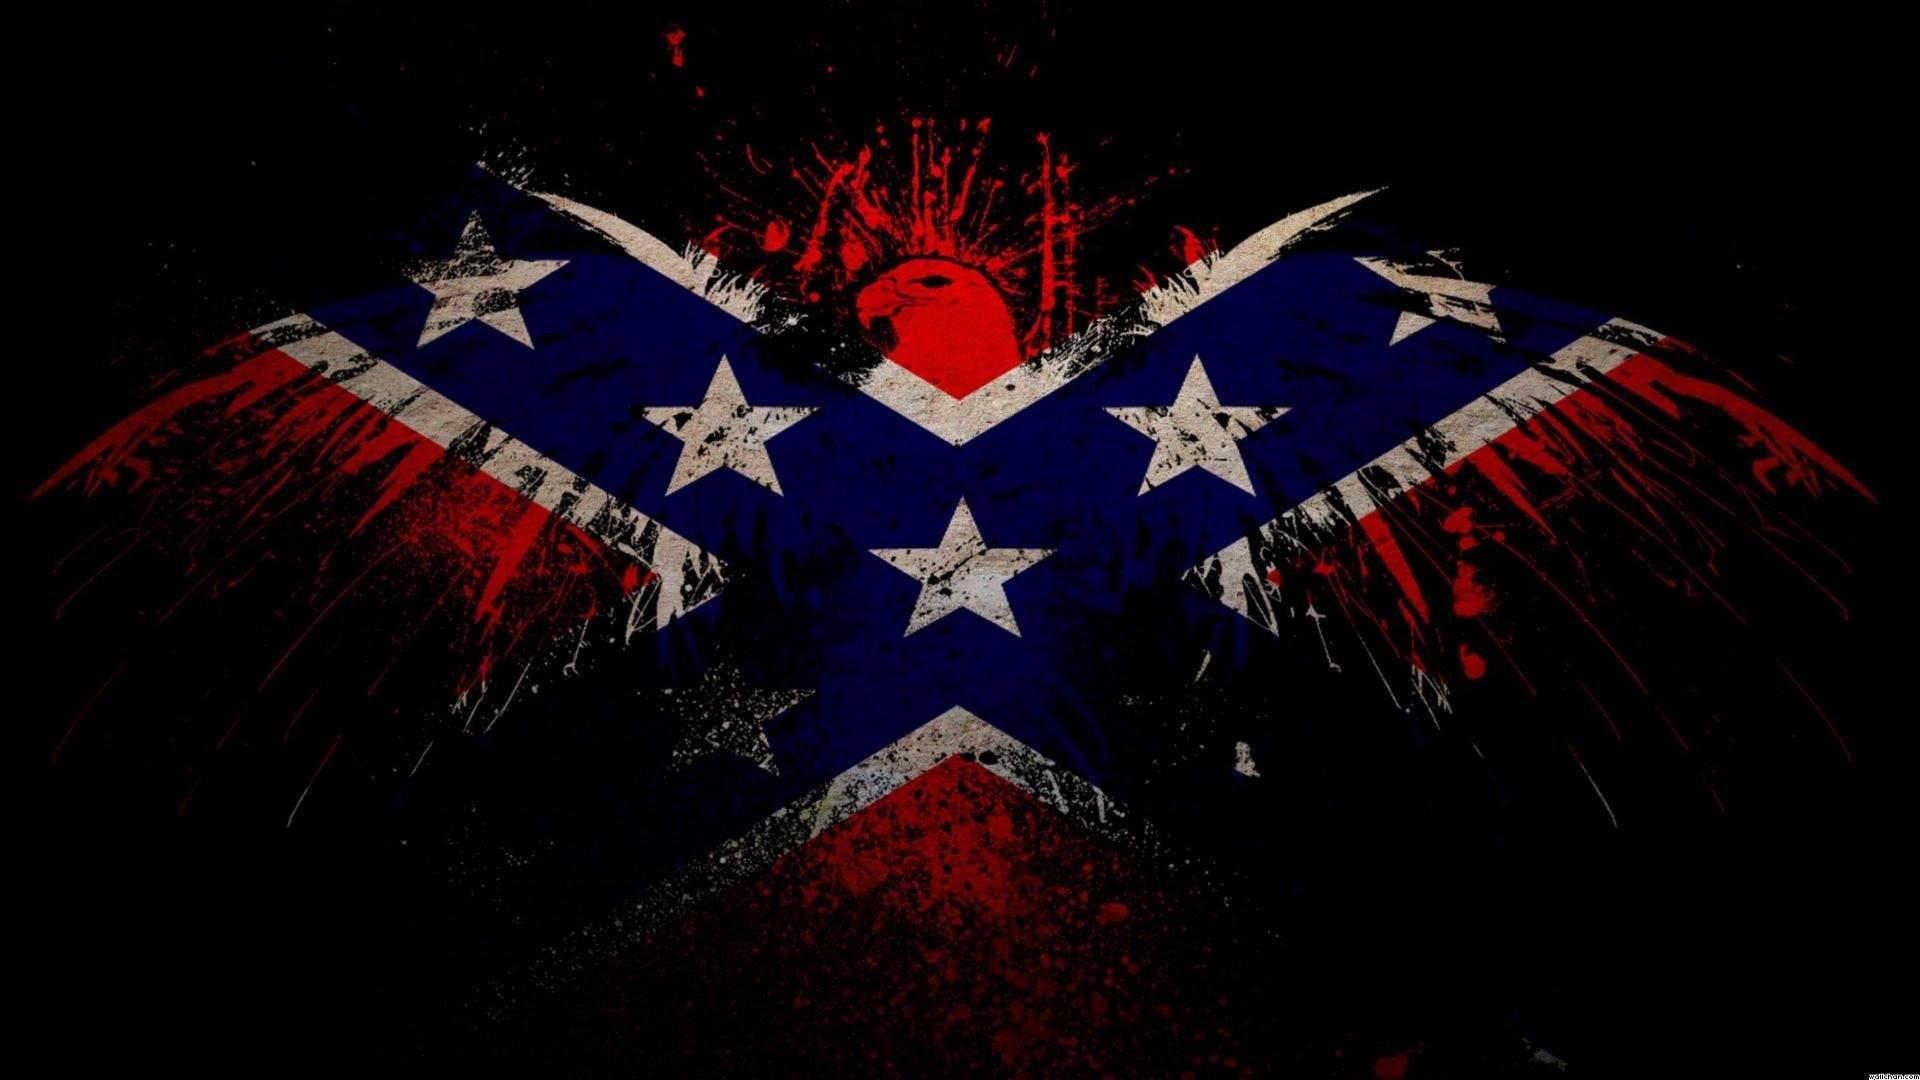 CONFEDERATE flag usa america united states csa civil war rebel dixie  military poster wallpaper | | 742415 | WallpaperUP